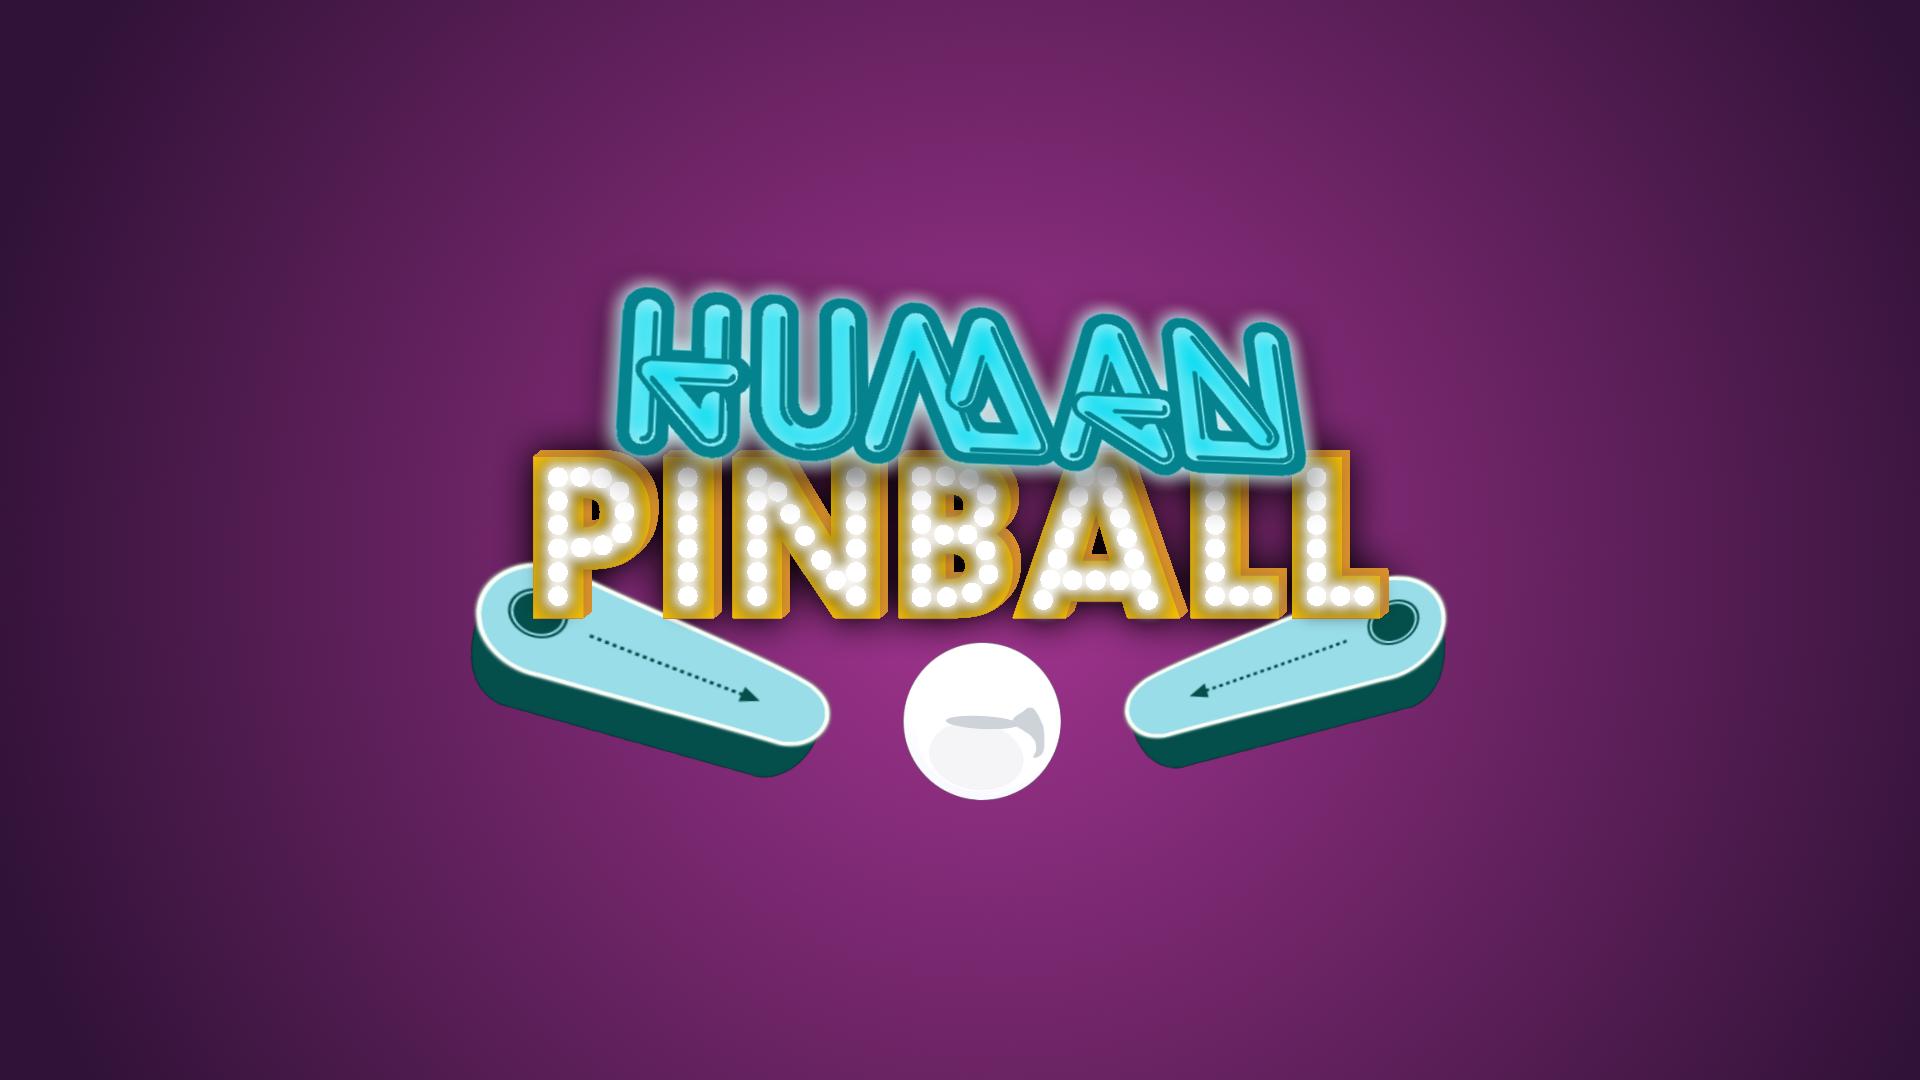 human pinball HD Youth group collective games